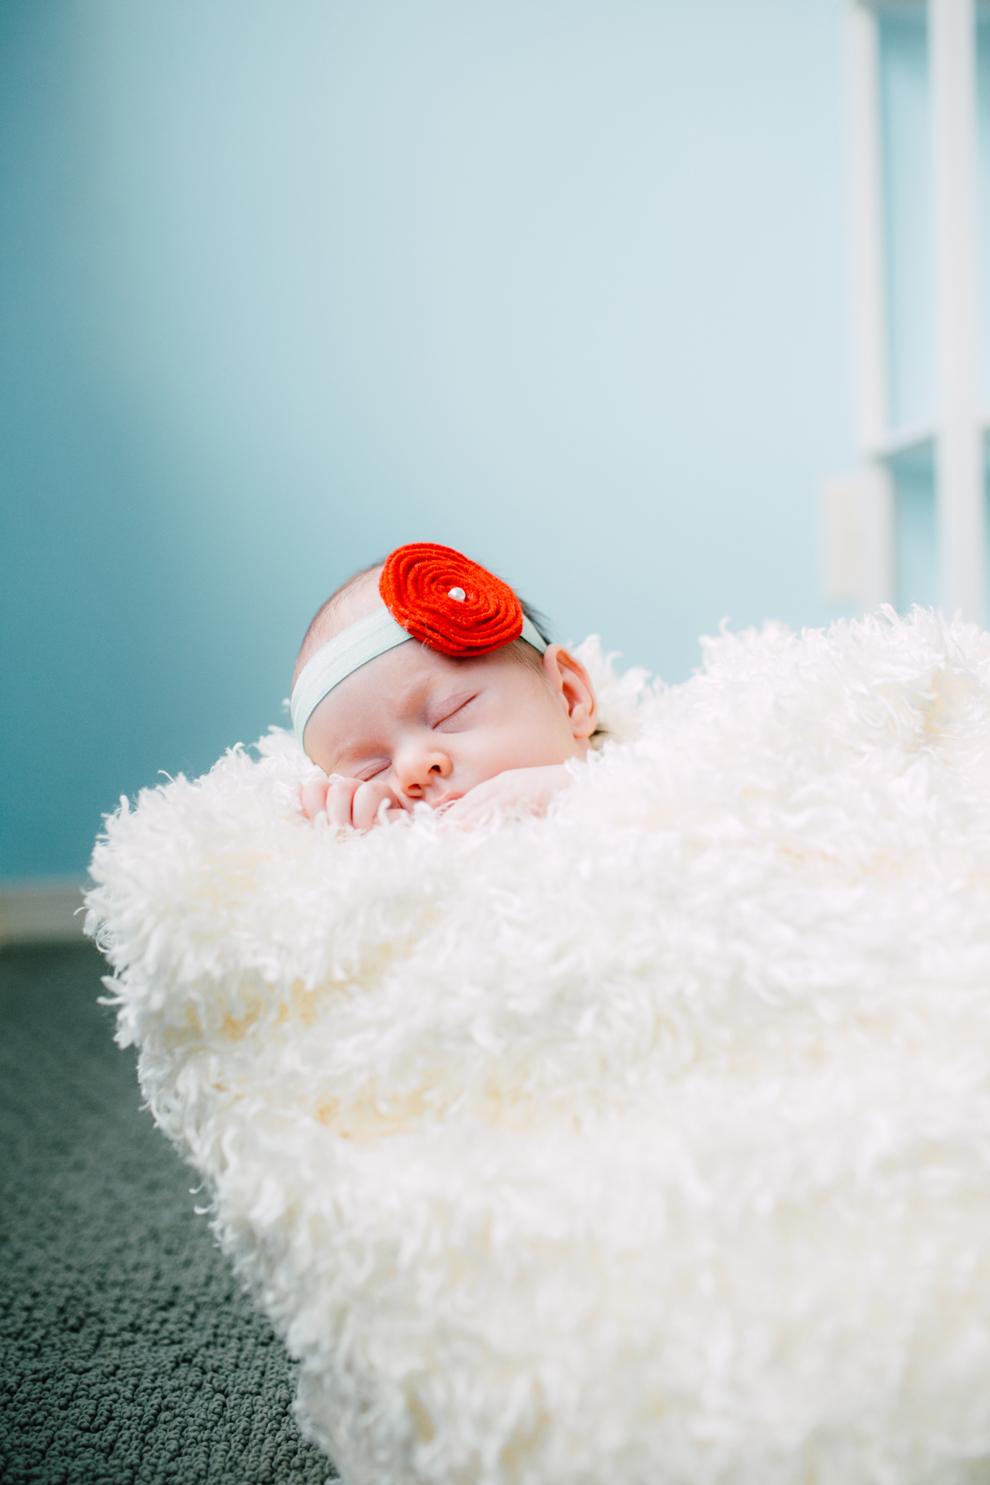 014-bellingham-newborn-photographer-photo-nursery-harper-lifestyle-session.jpg